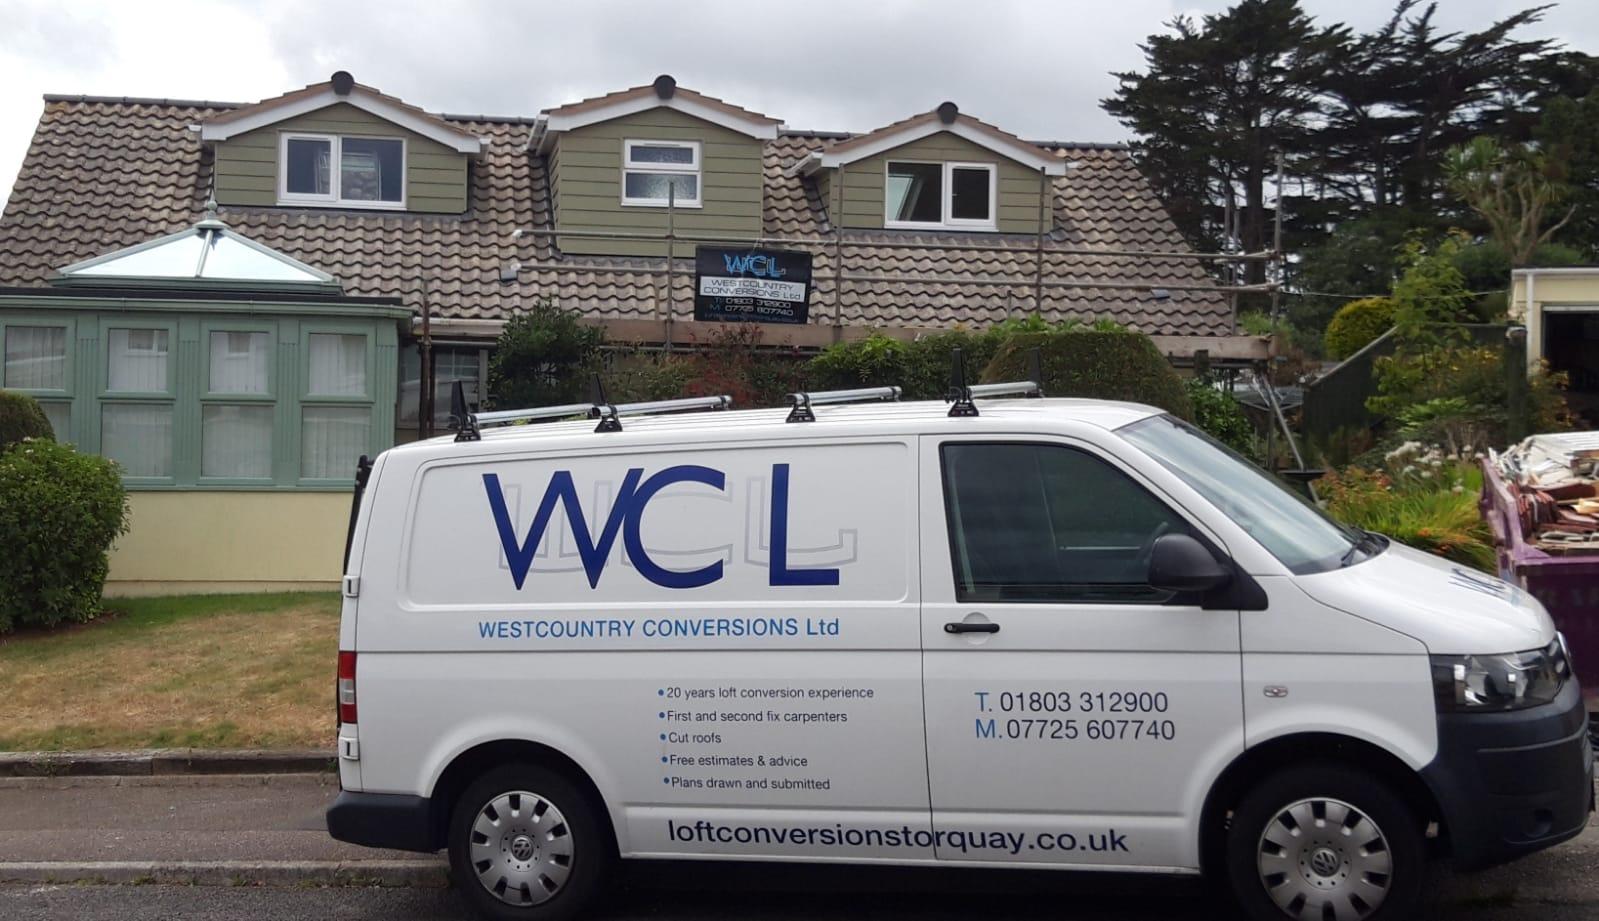 Westcountry Conversions Ltd